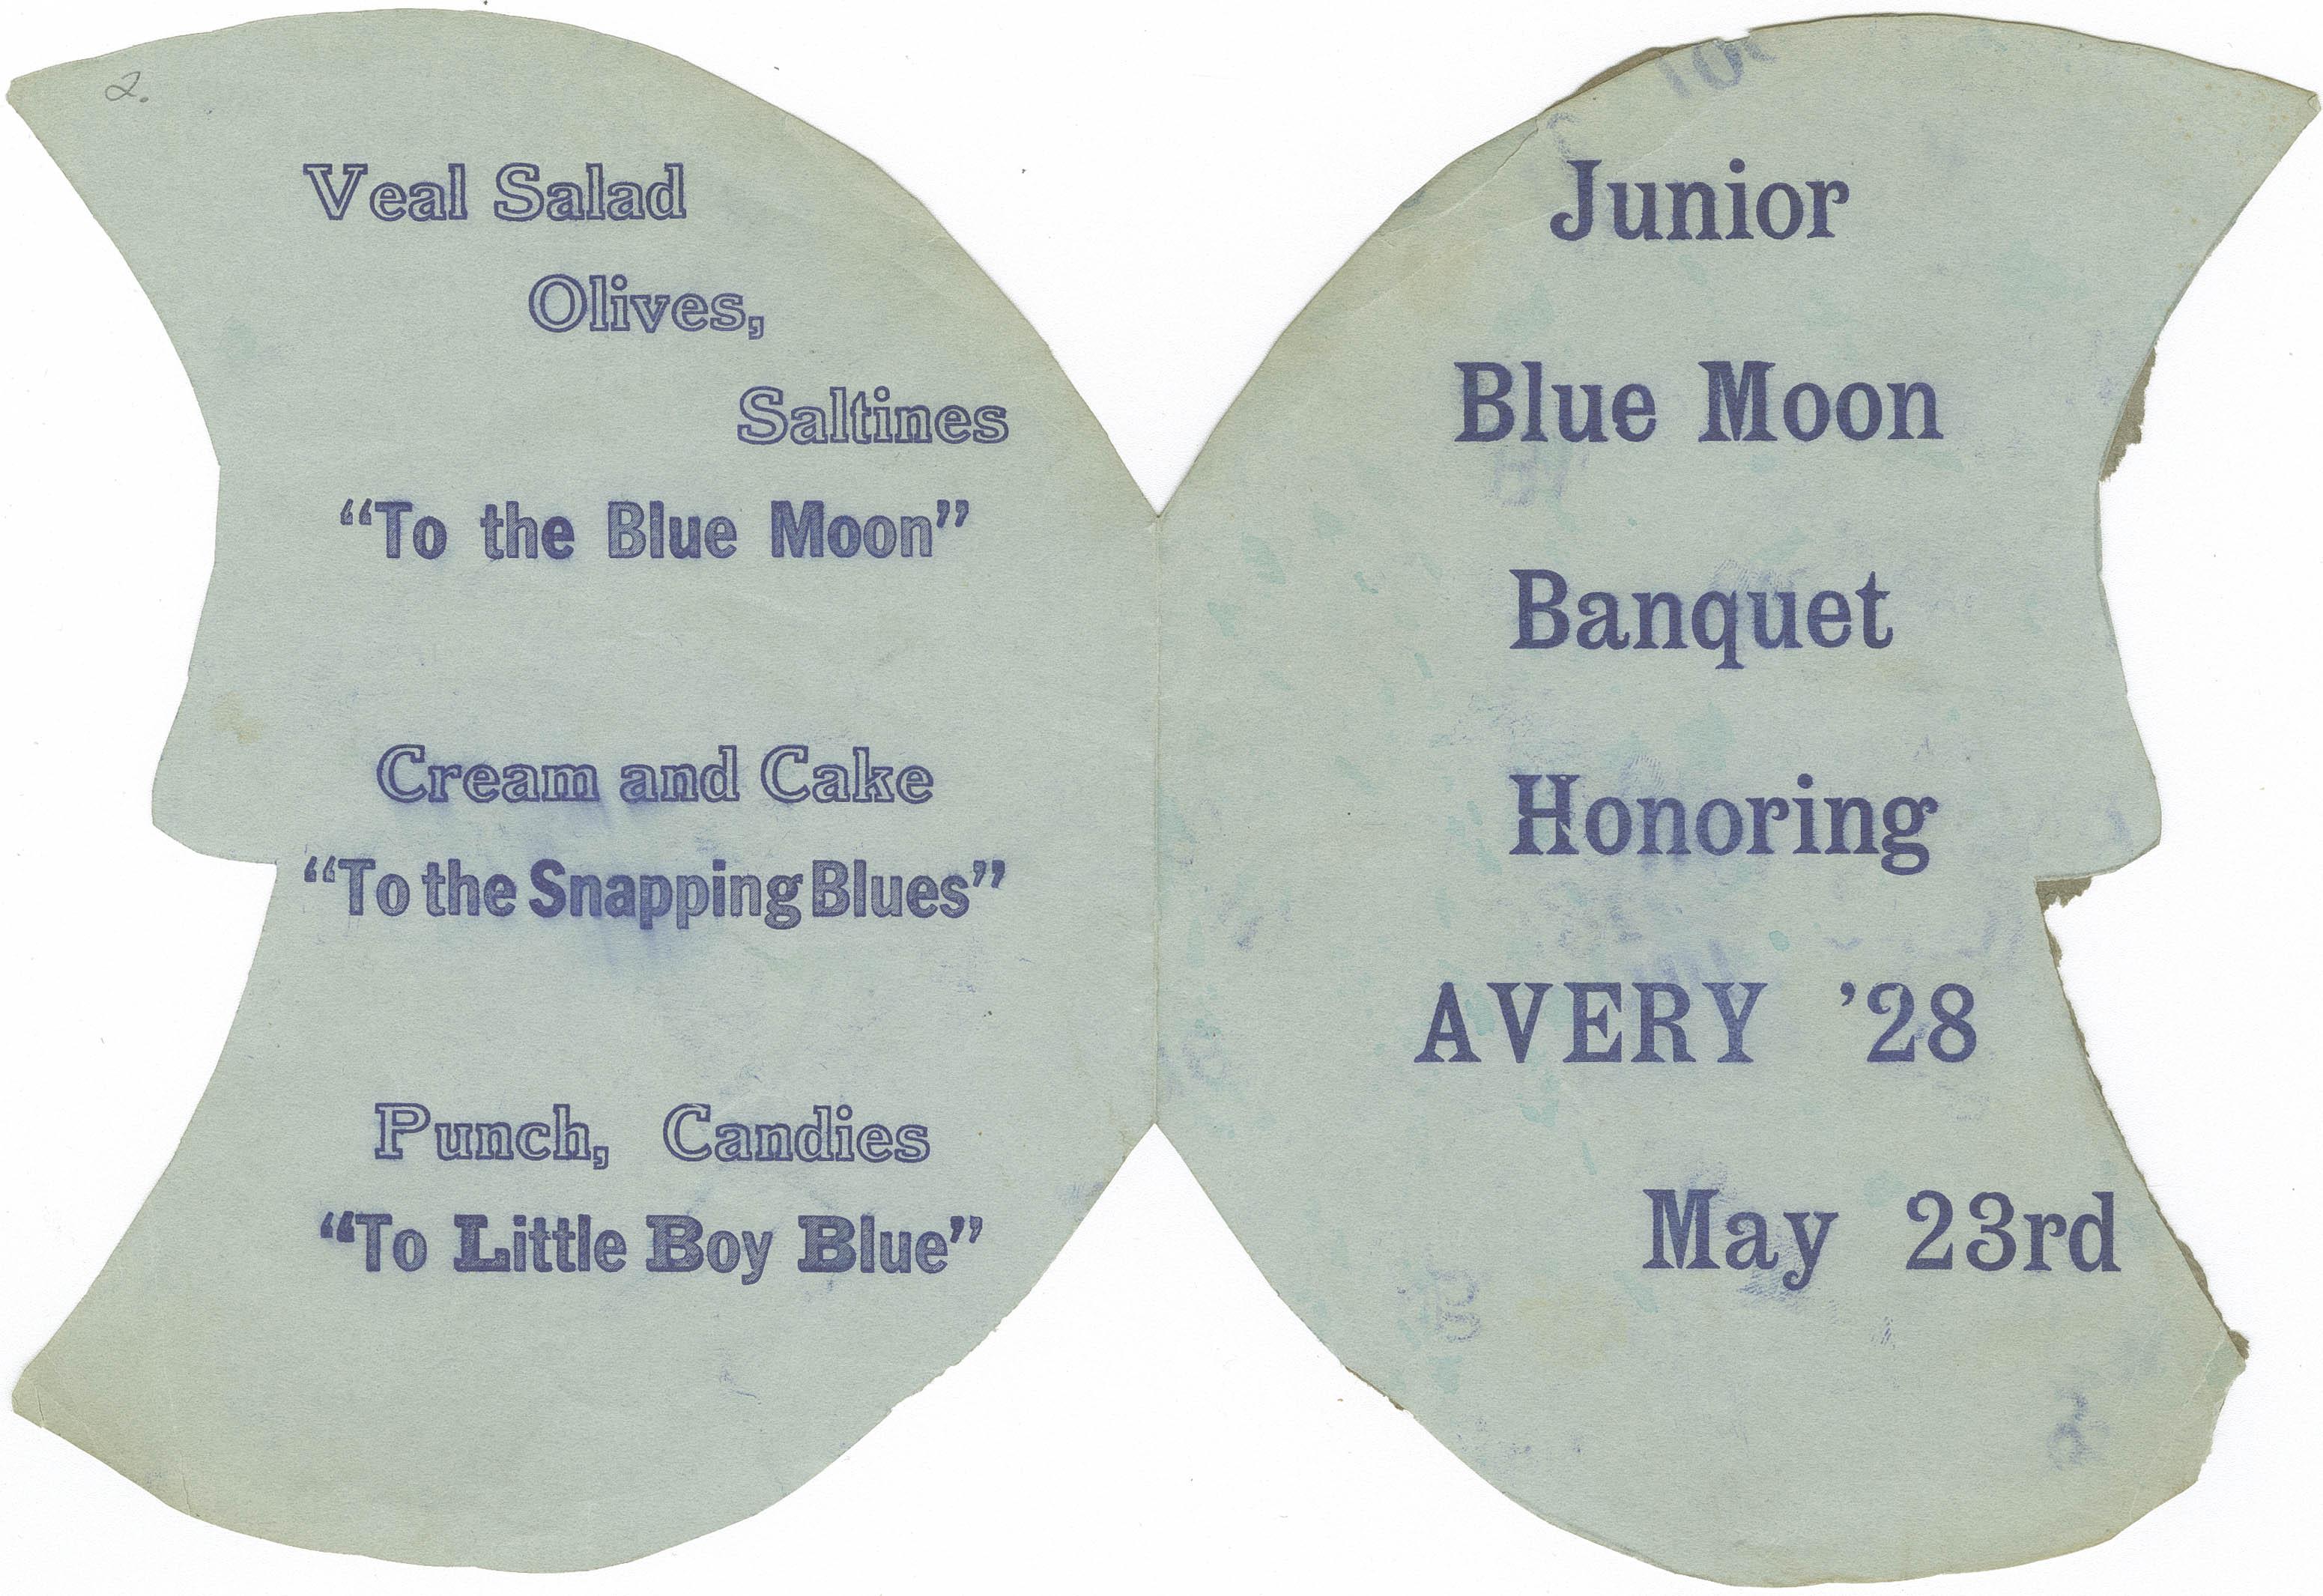 Menu for the Junior Blue Moon Banquet